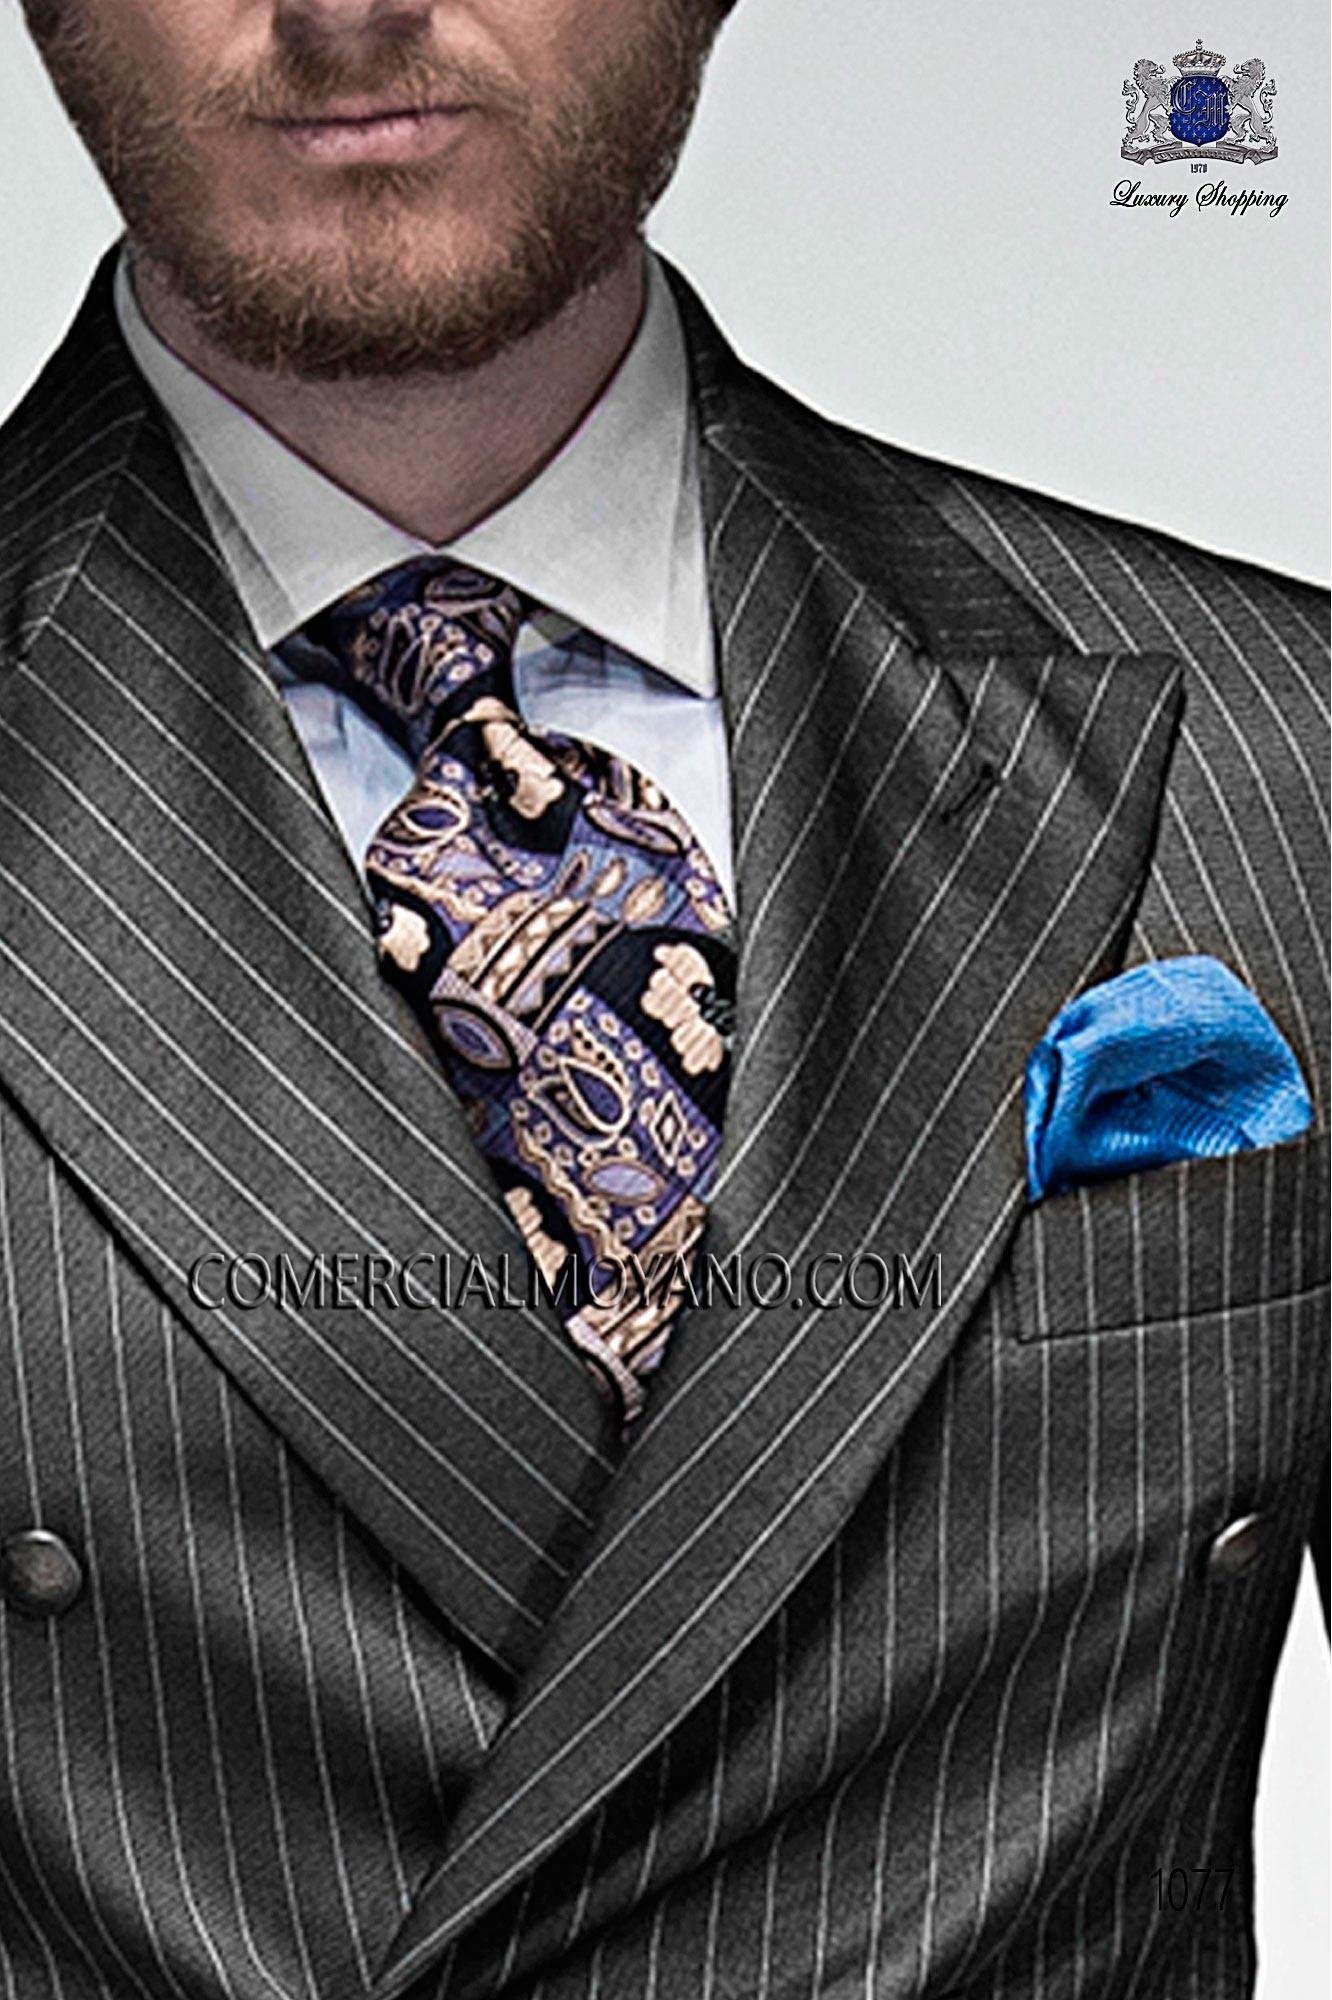 Blaue Krawatte aus reiner Seide Jacquard-Stoff, Ottavio